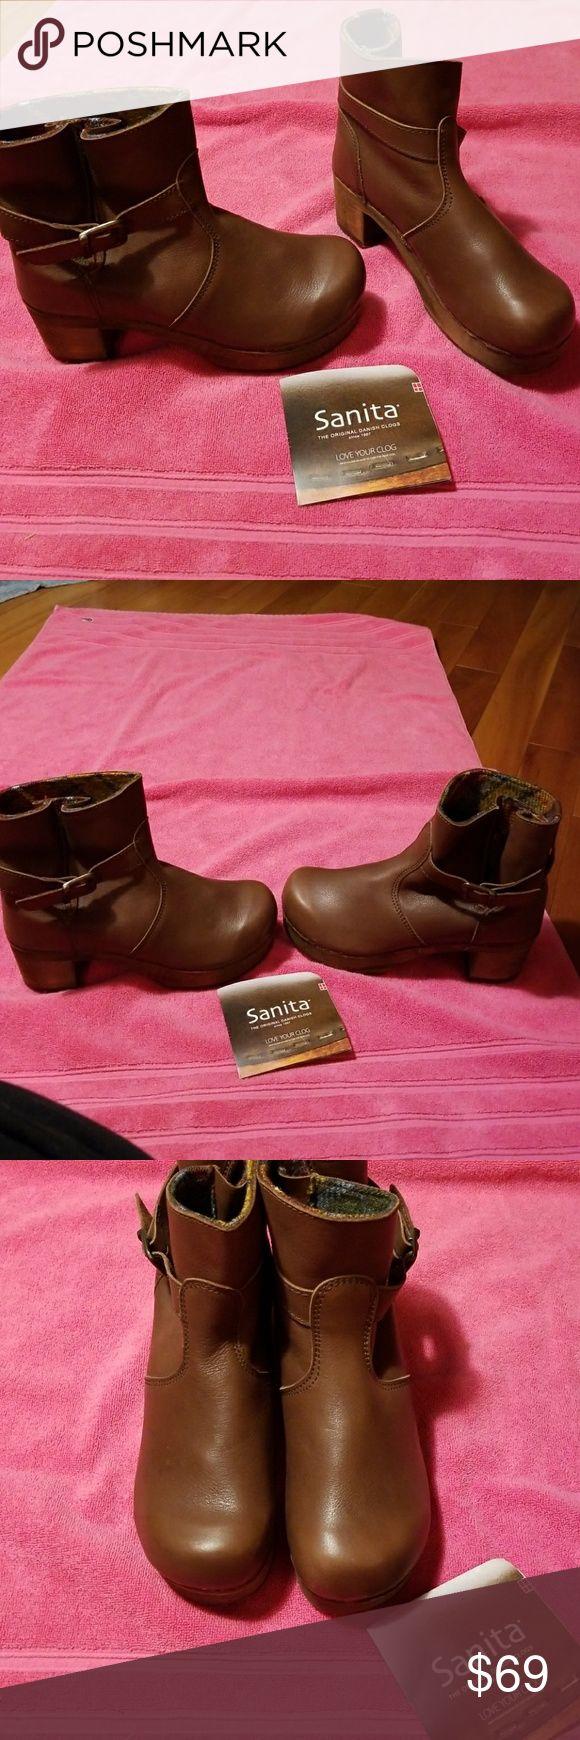 Sanita Wooden Clogs Sanita Brown Danish Clogs NEVER BEEN WORN. SIZE 8 Sanita Shoes Mules & Clogs